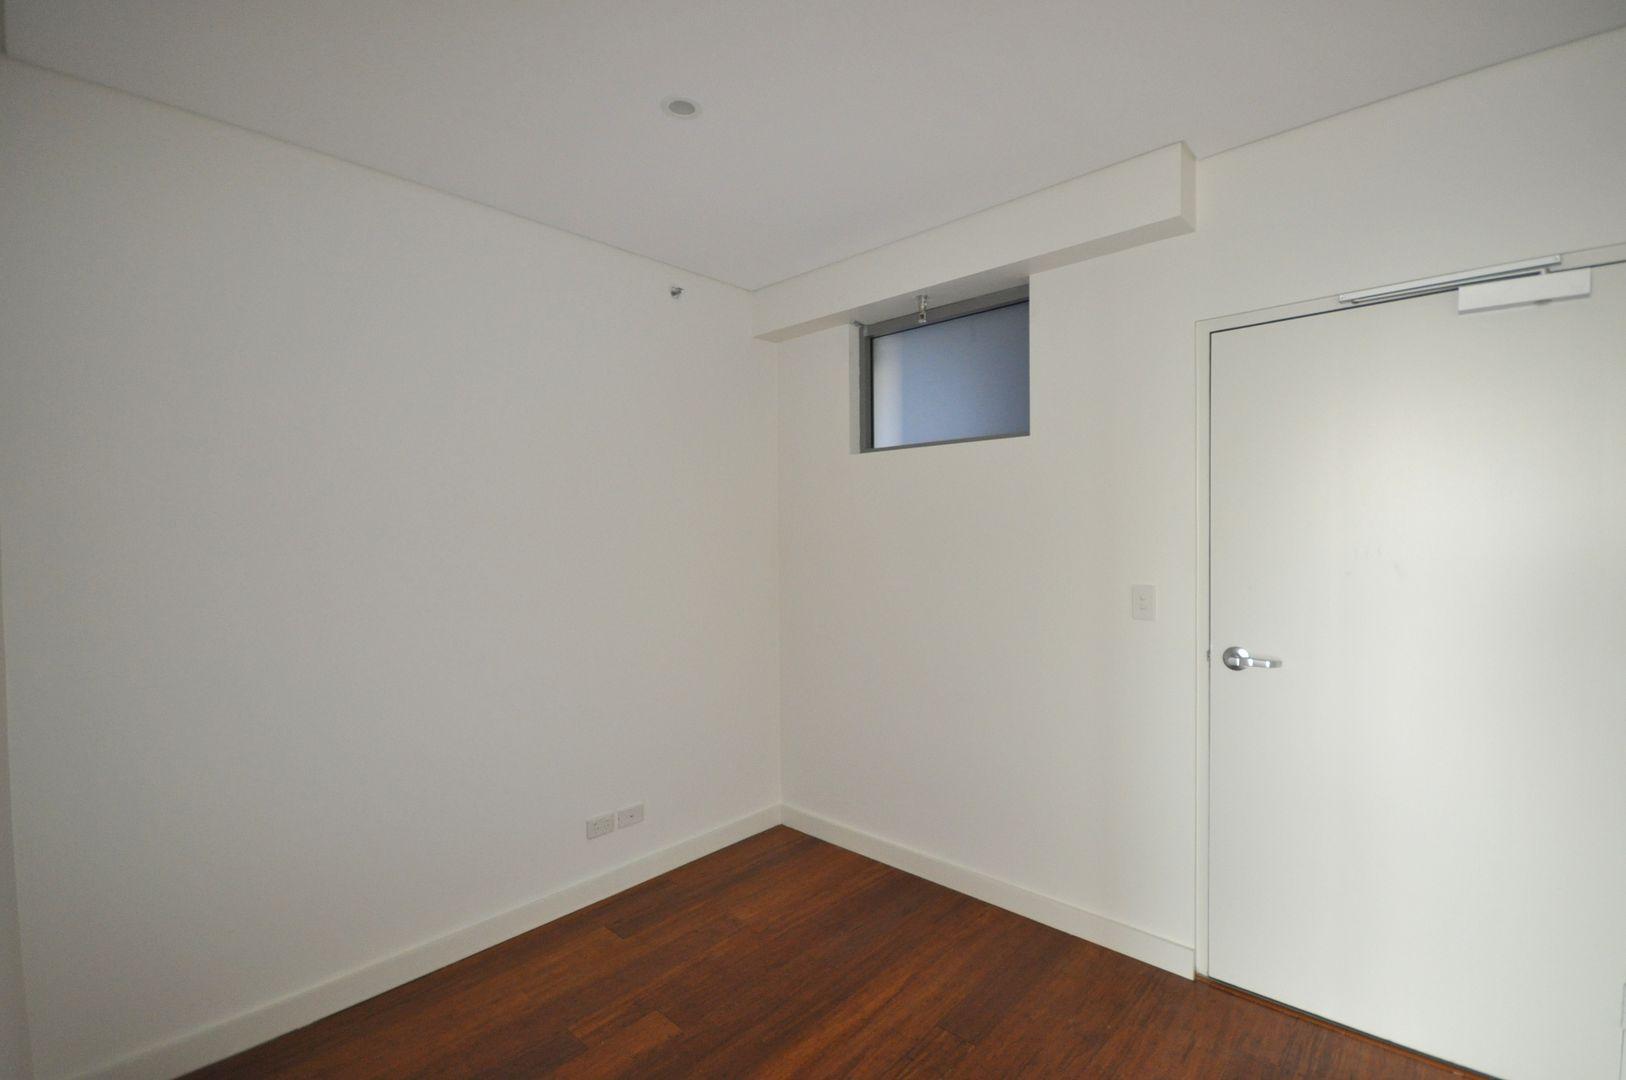 704/10-12 French Avenue, Bankstown NSW 2200, Image 1